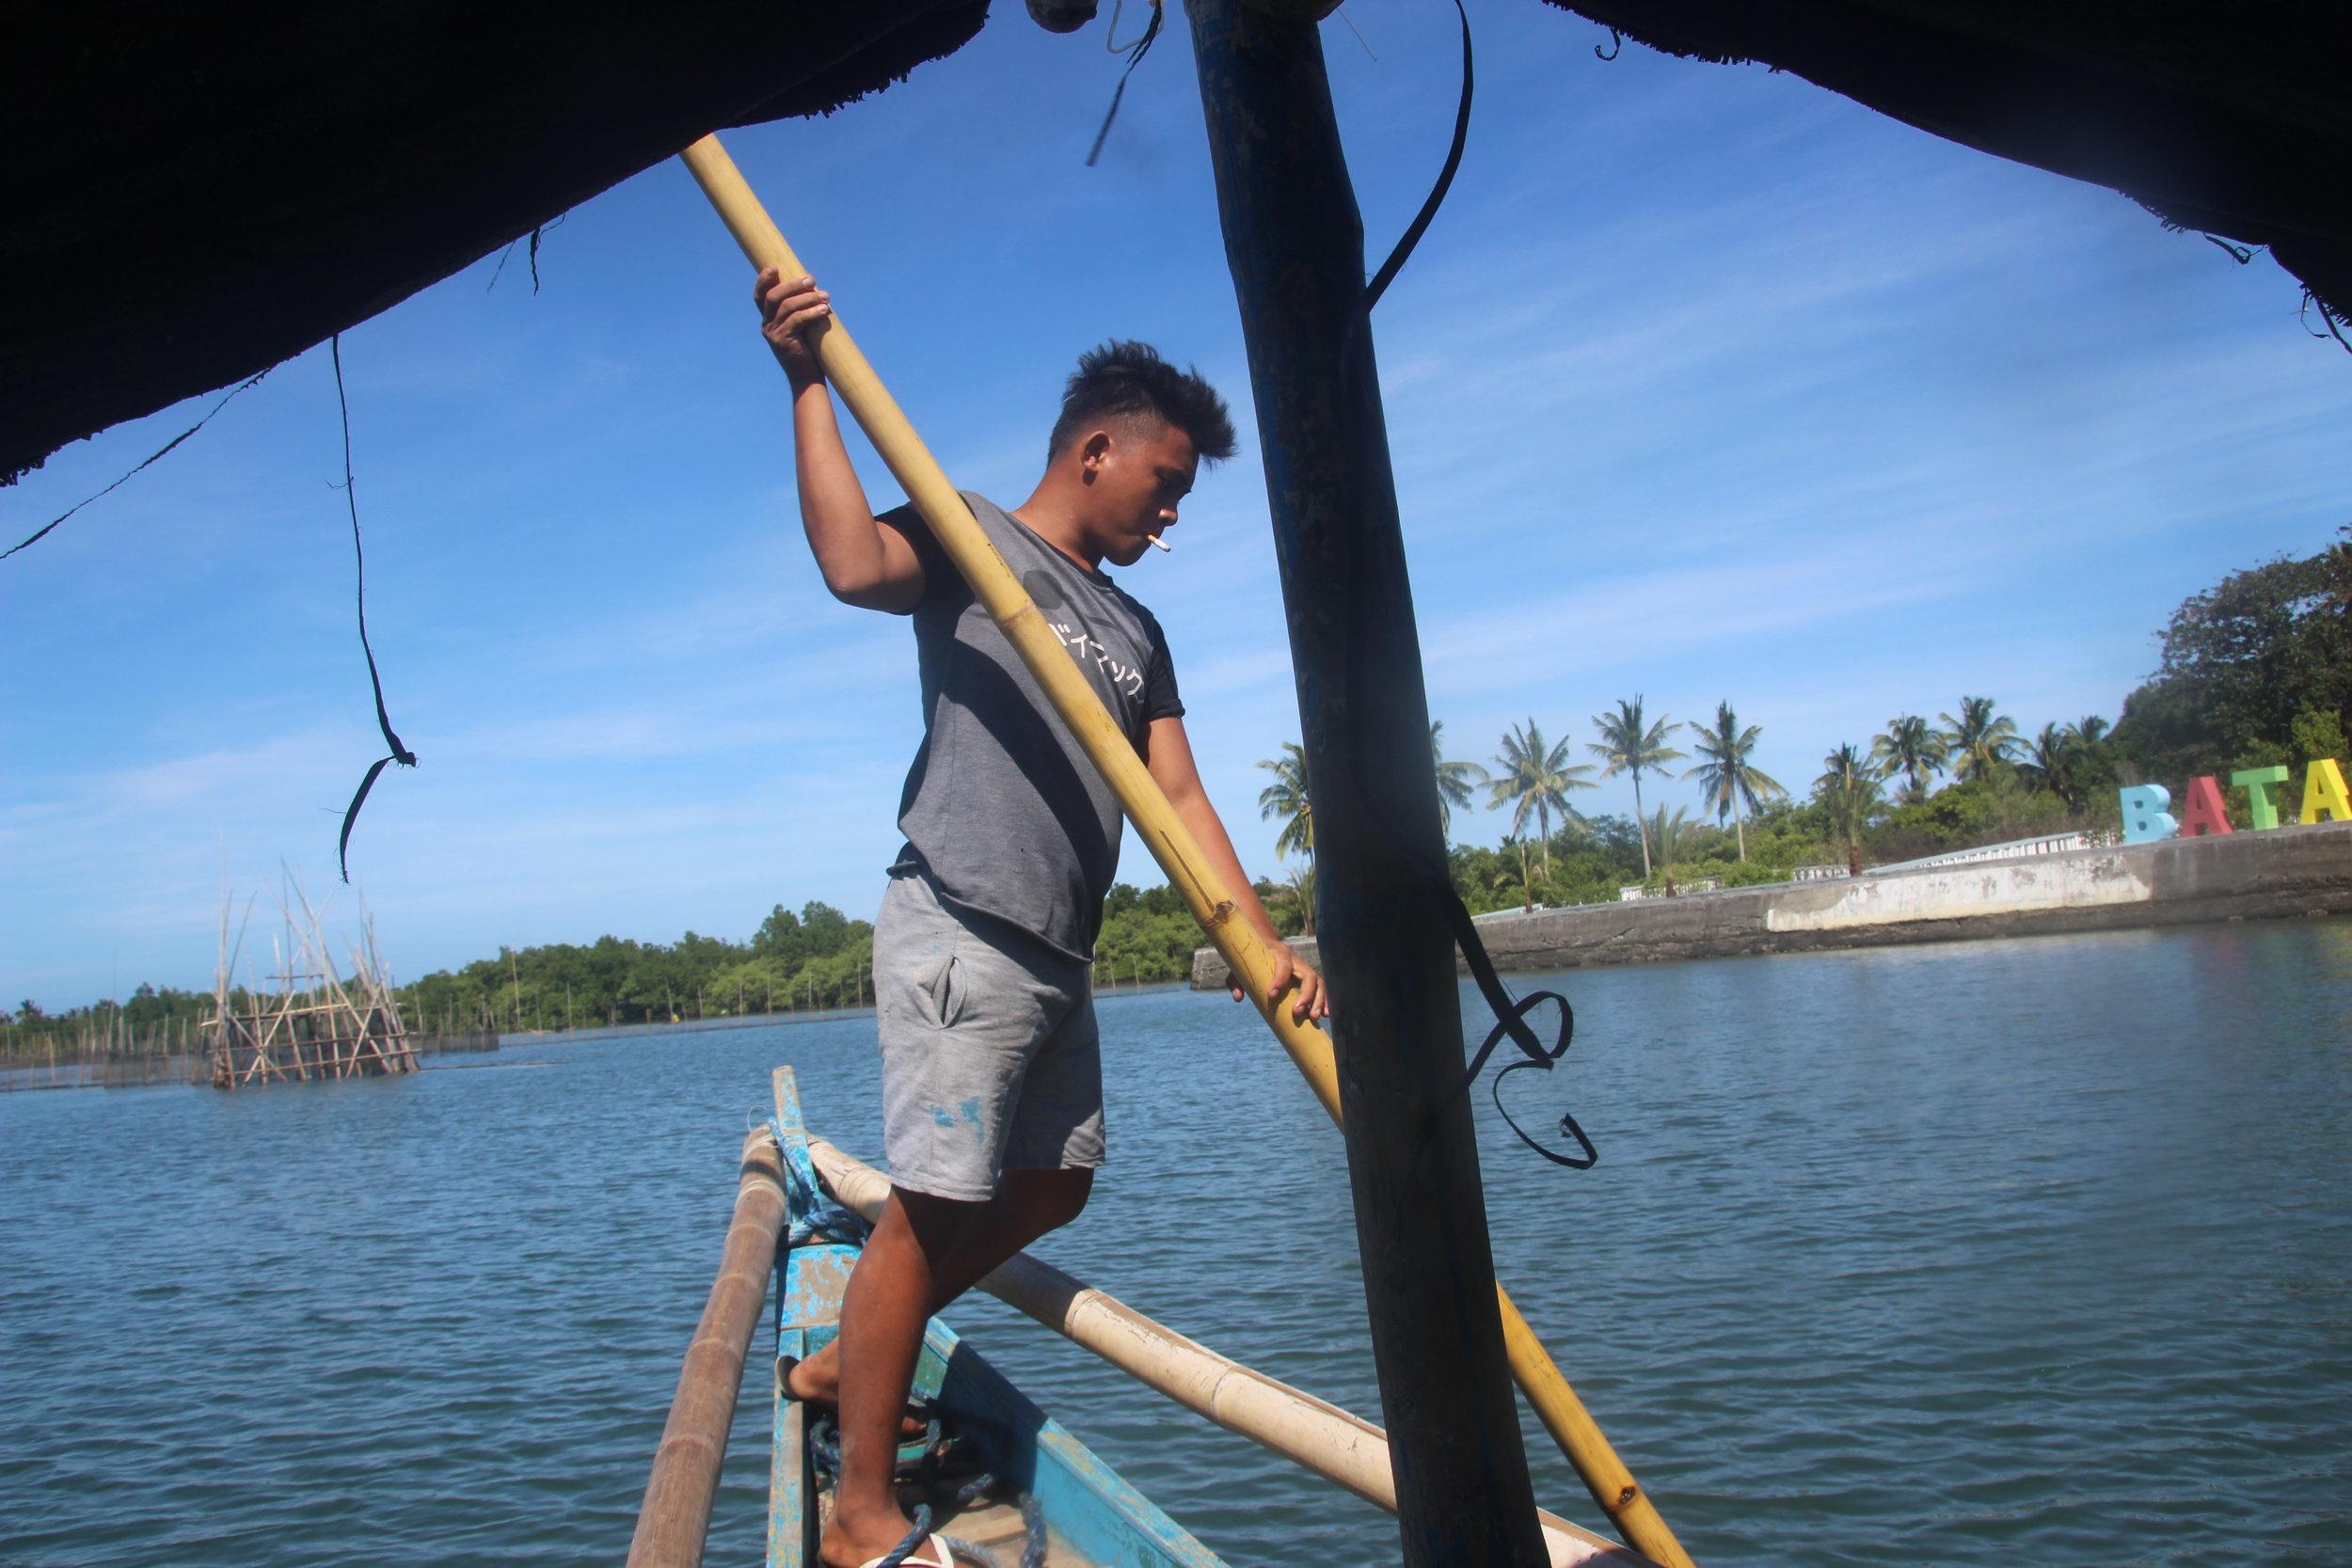 TinagongDagatIMG_8610.JPG